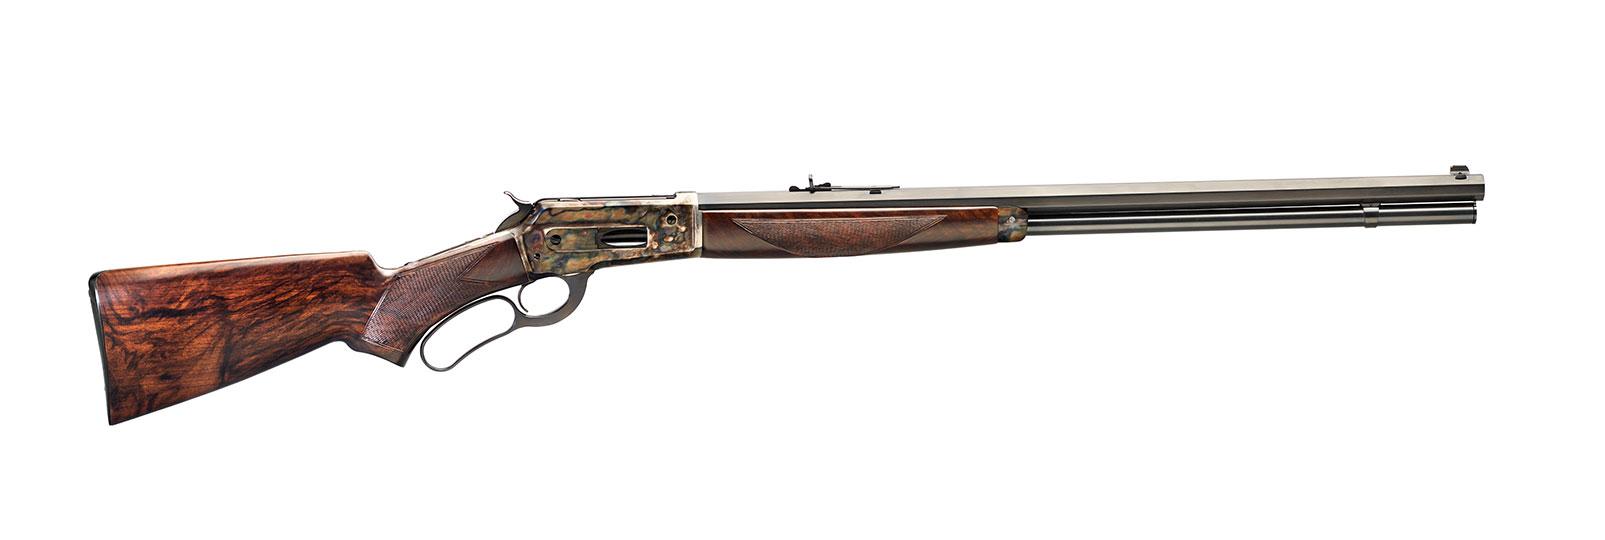 1886 Sporting Rifle